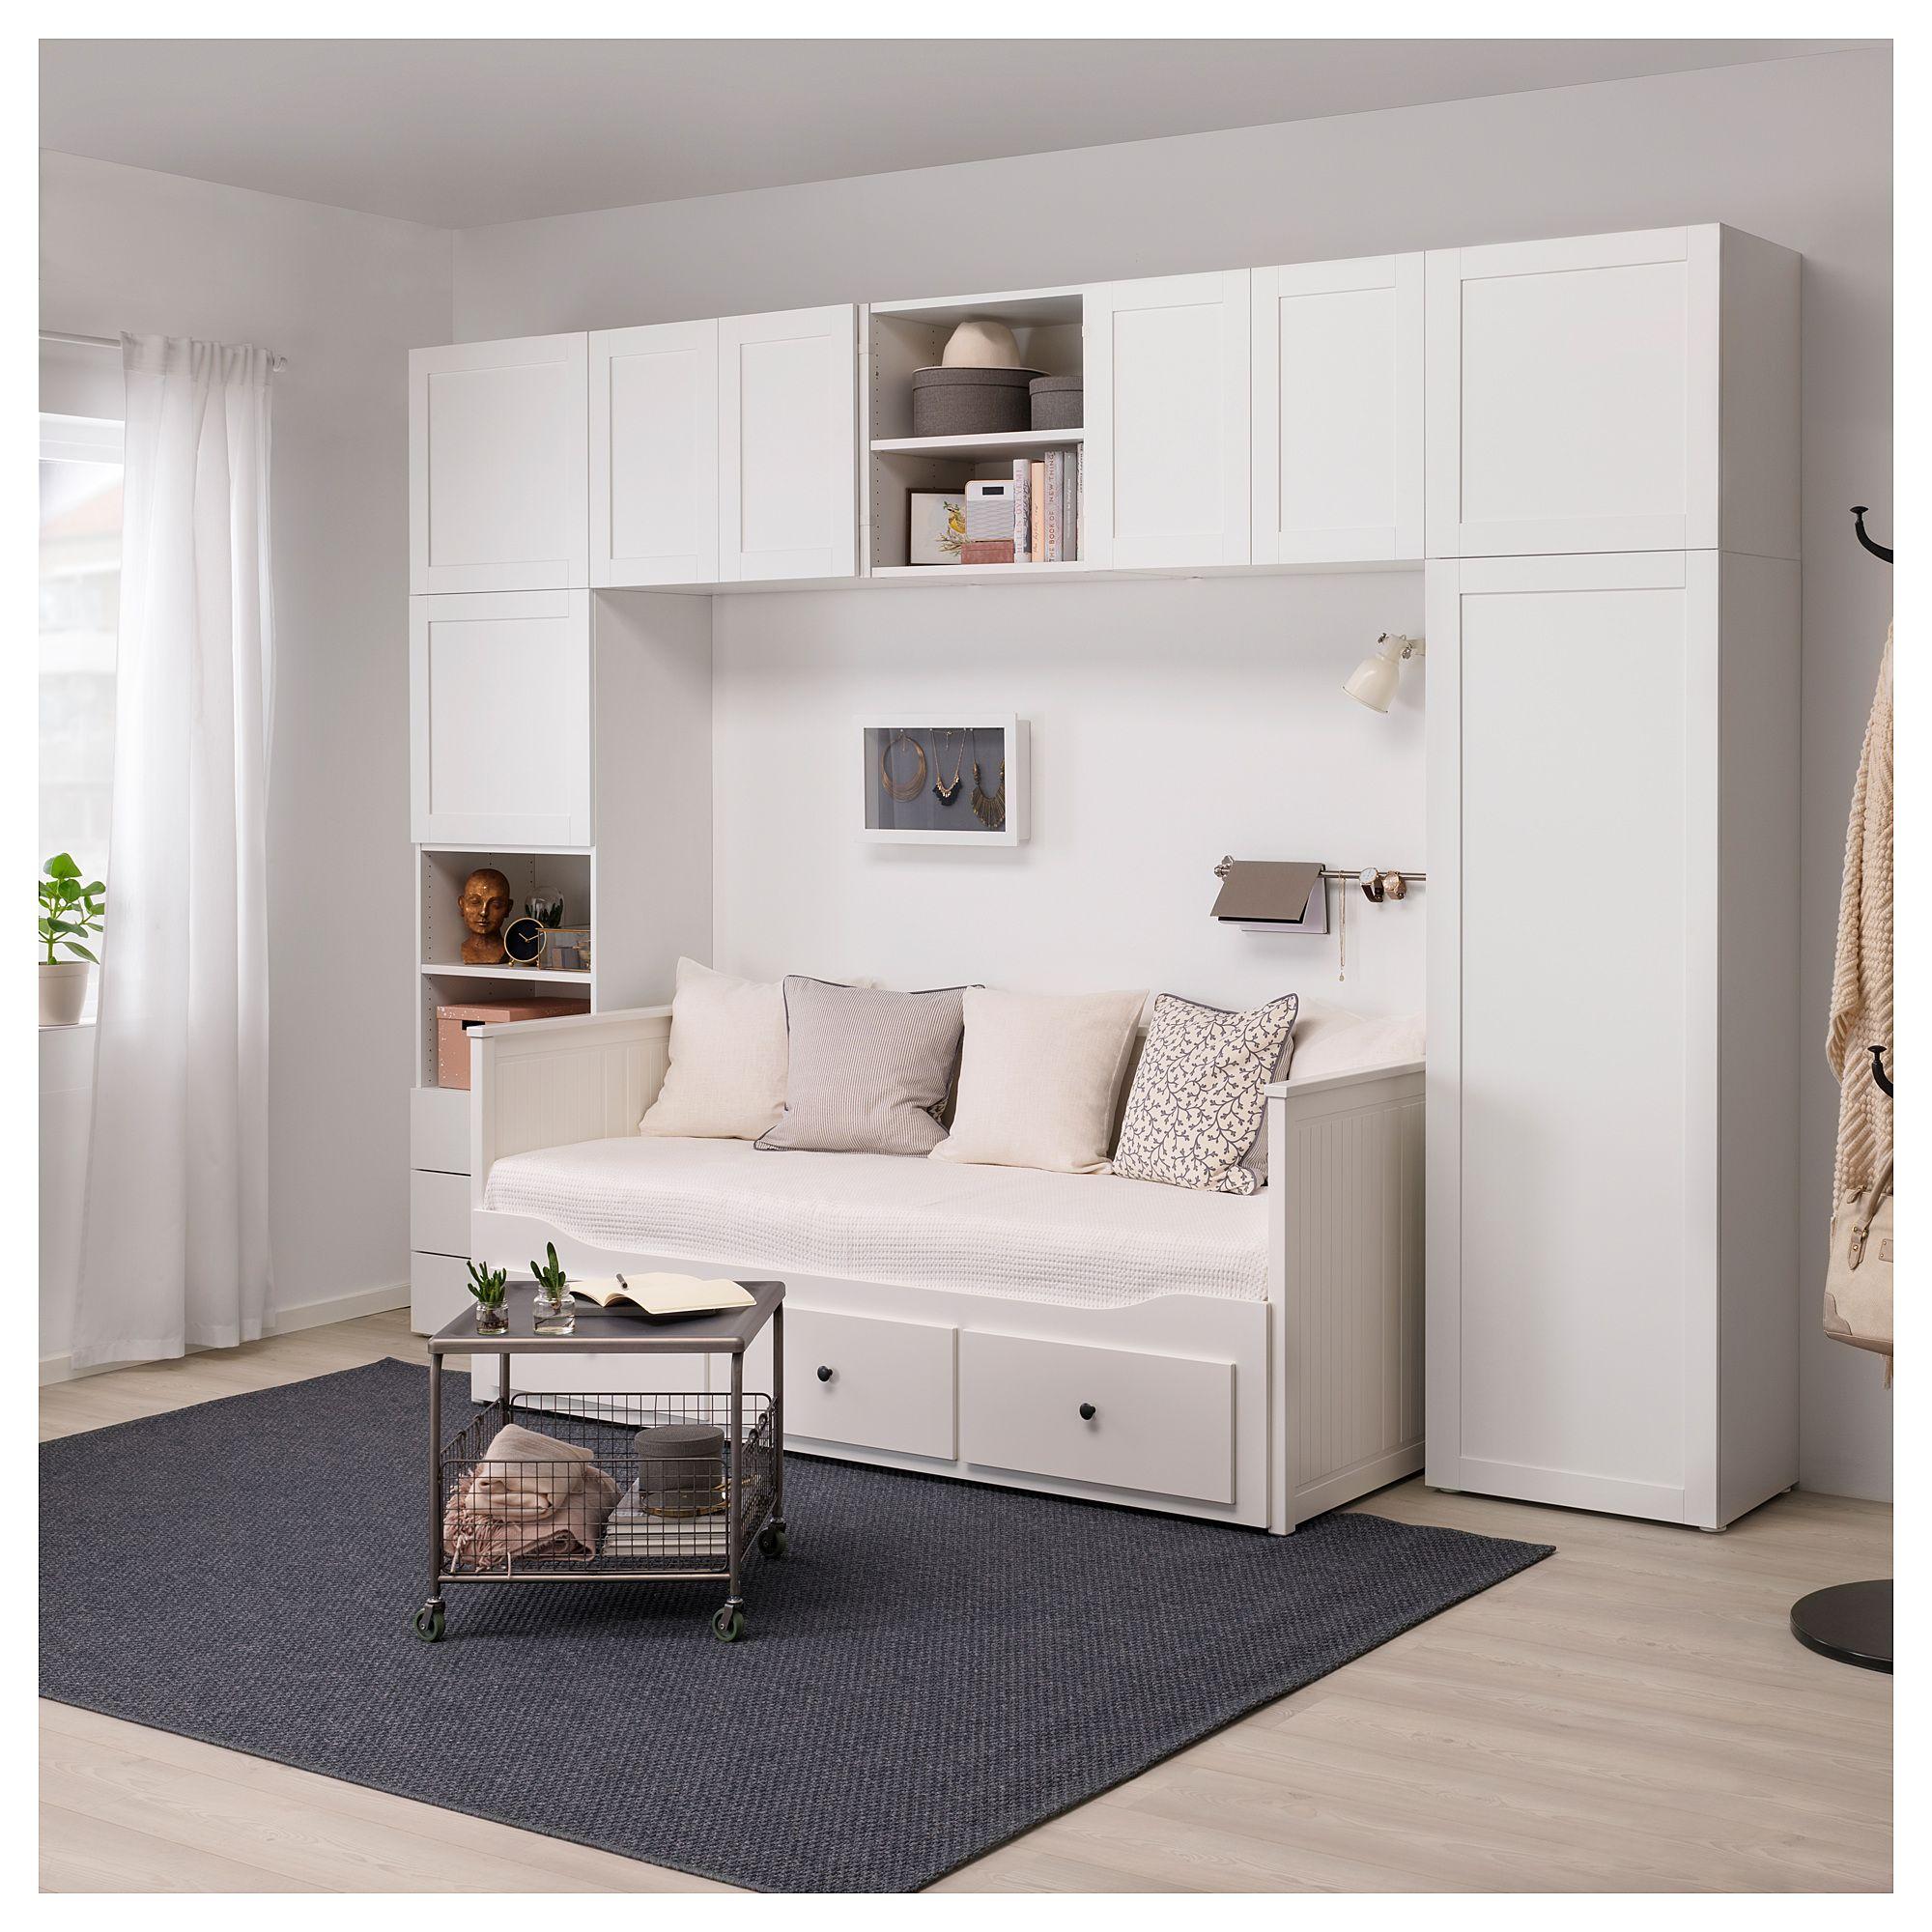 Platsa Wardrobe White Fonnes Sannidal Ikea Alex Bedroom In